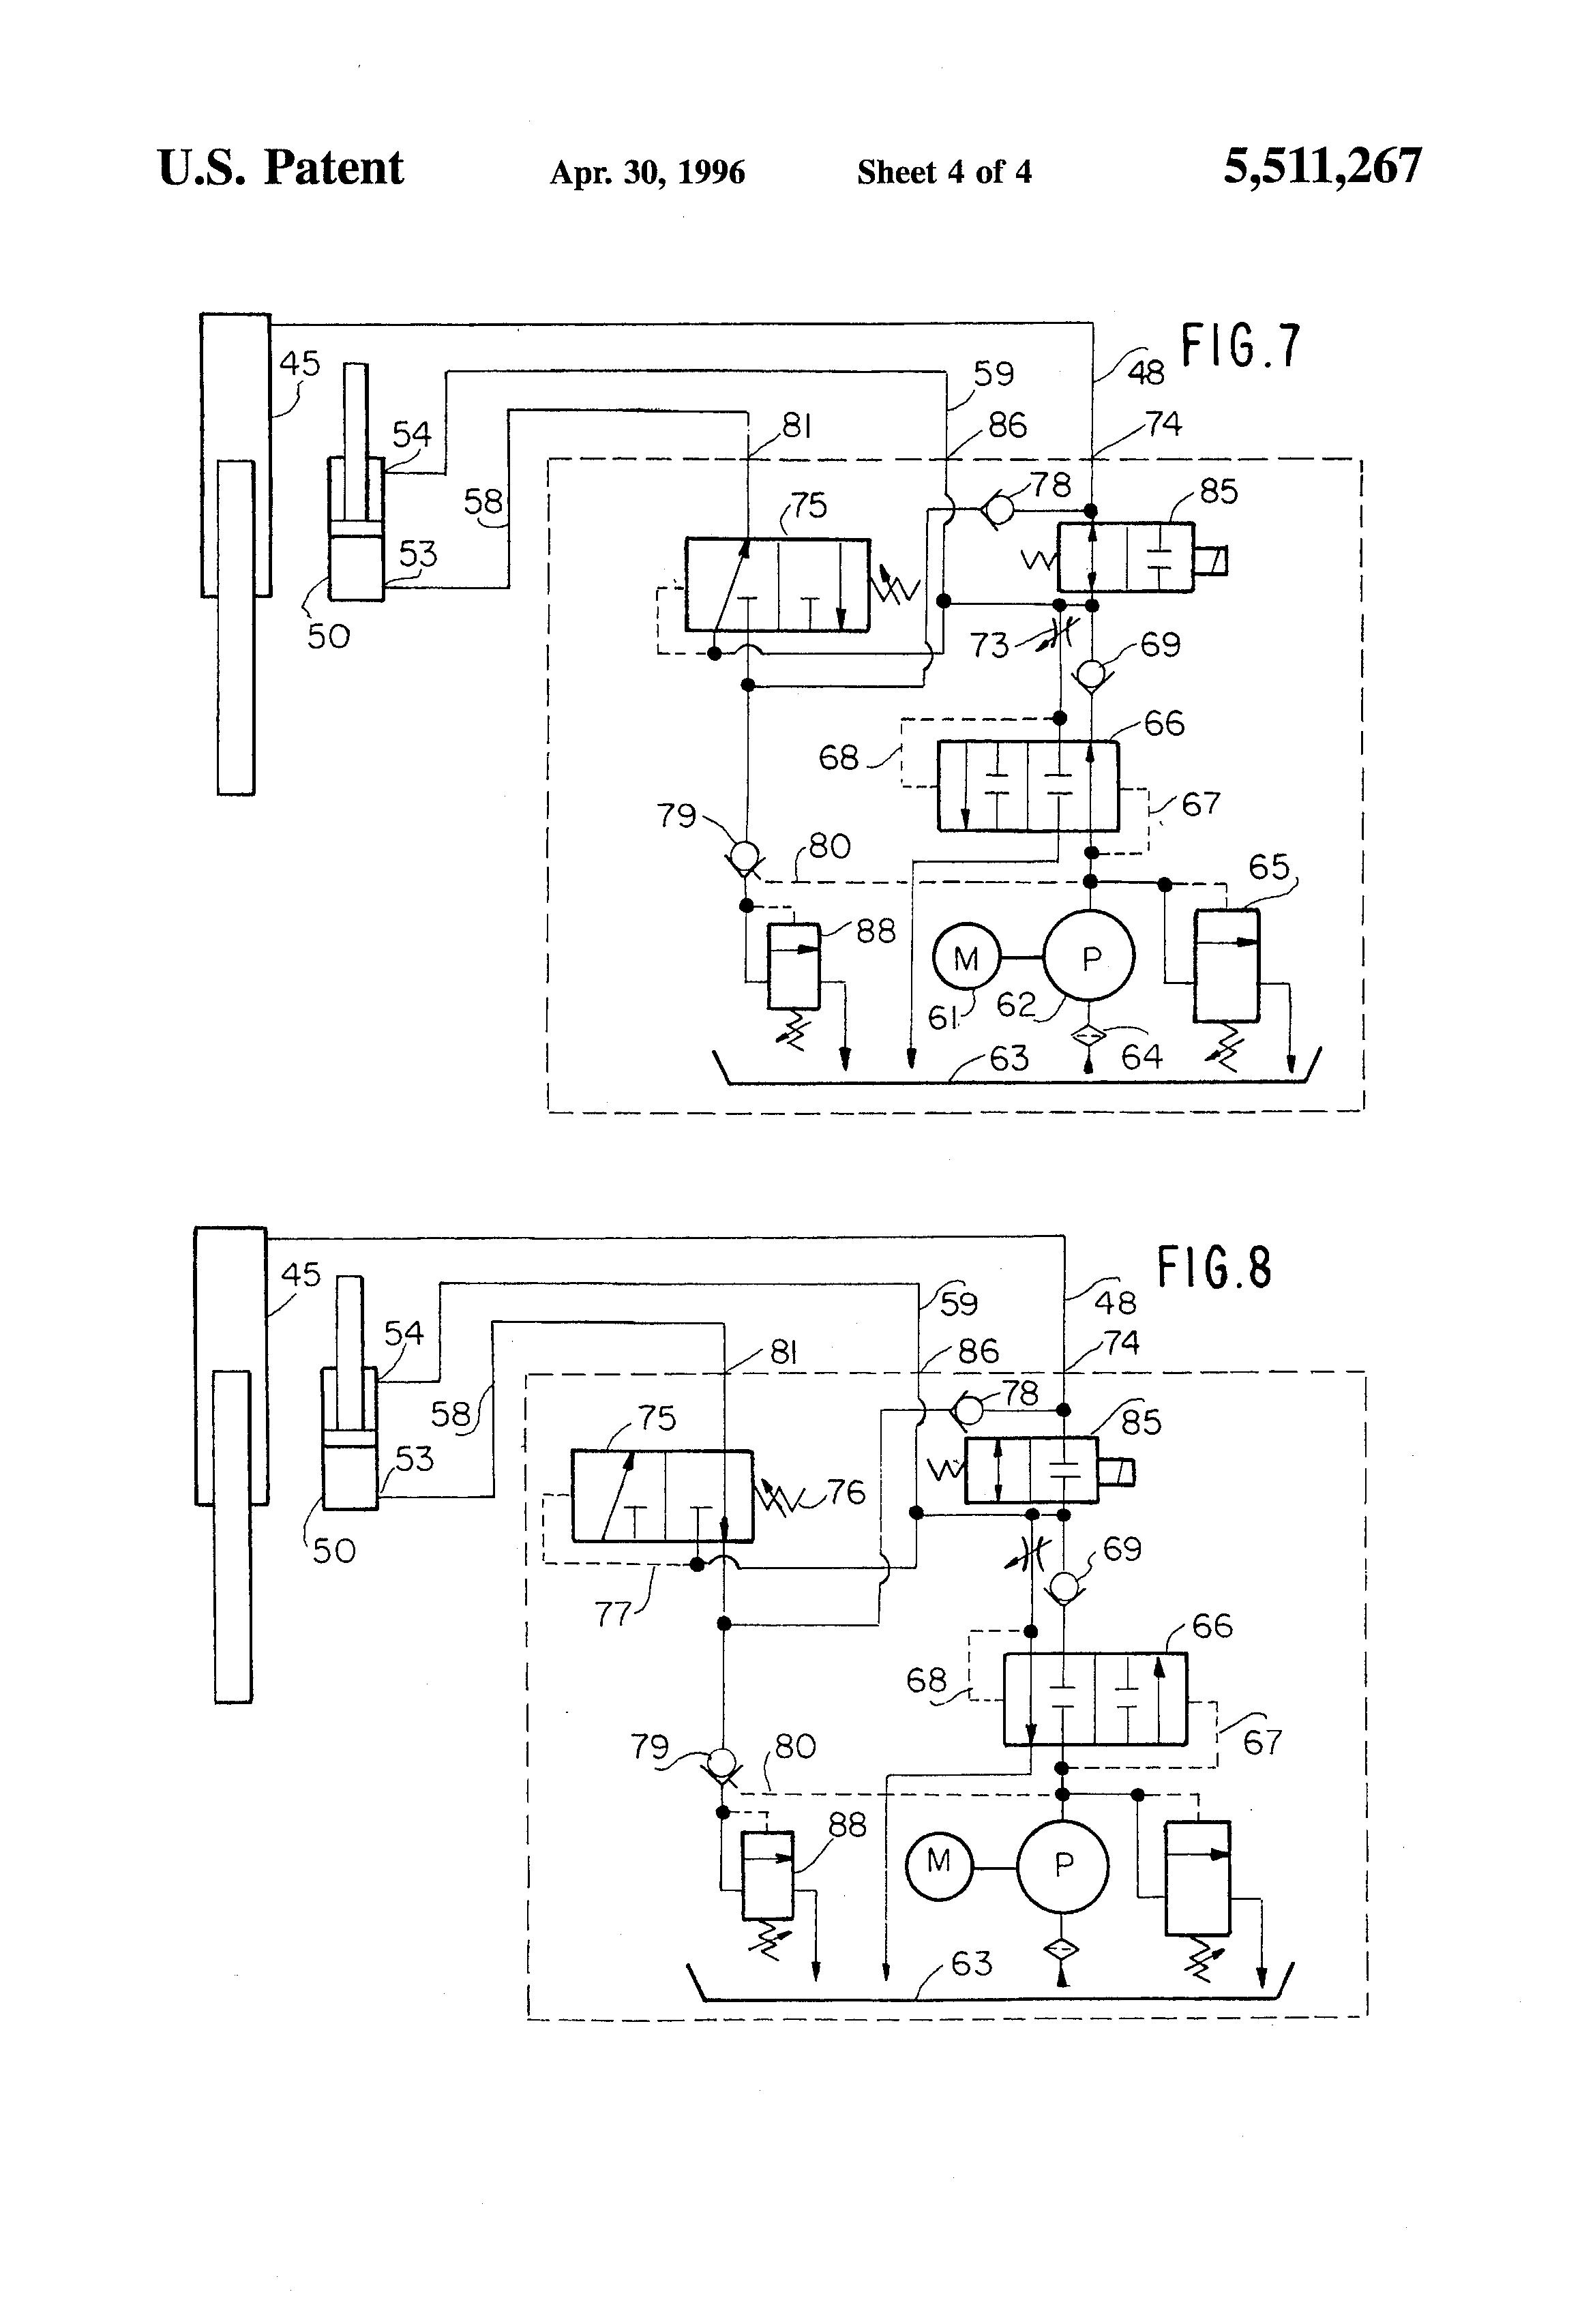 32 Serco Dock Leveler Parts Diagram